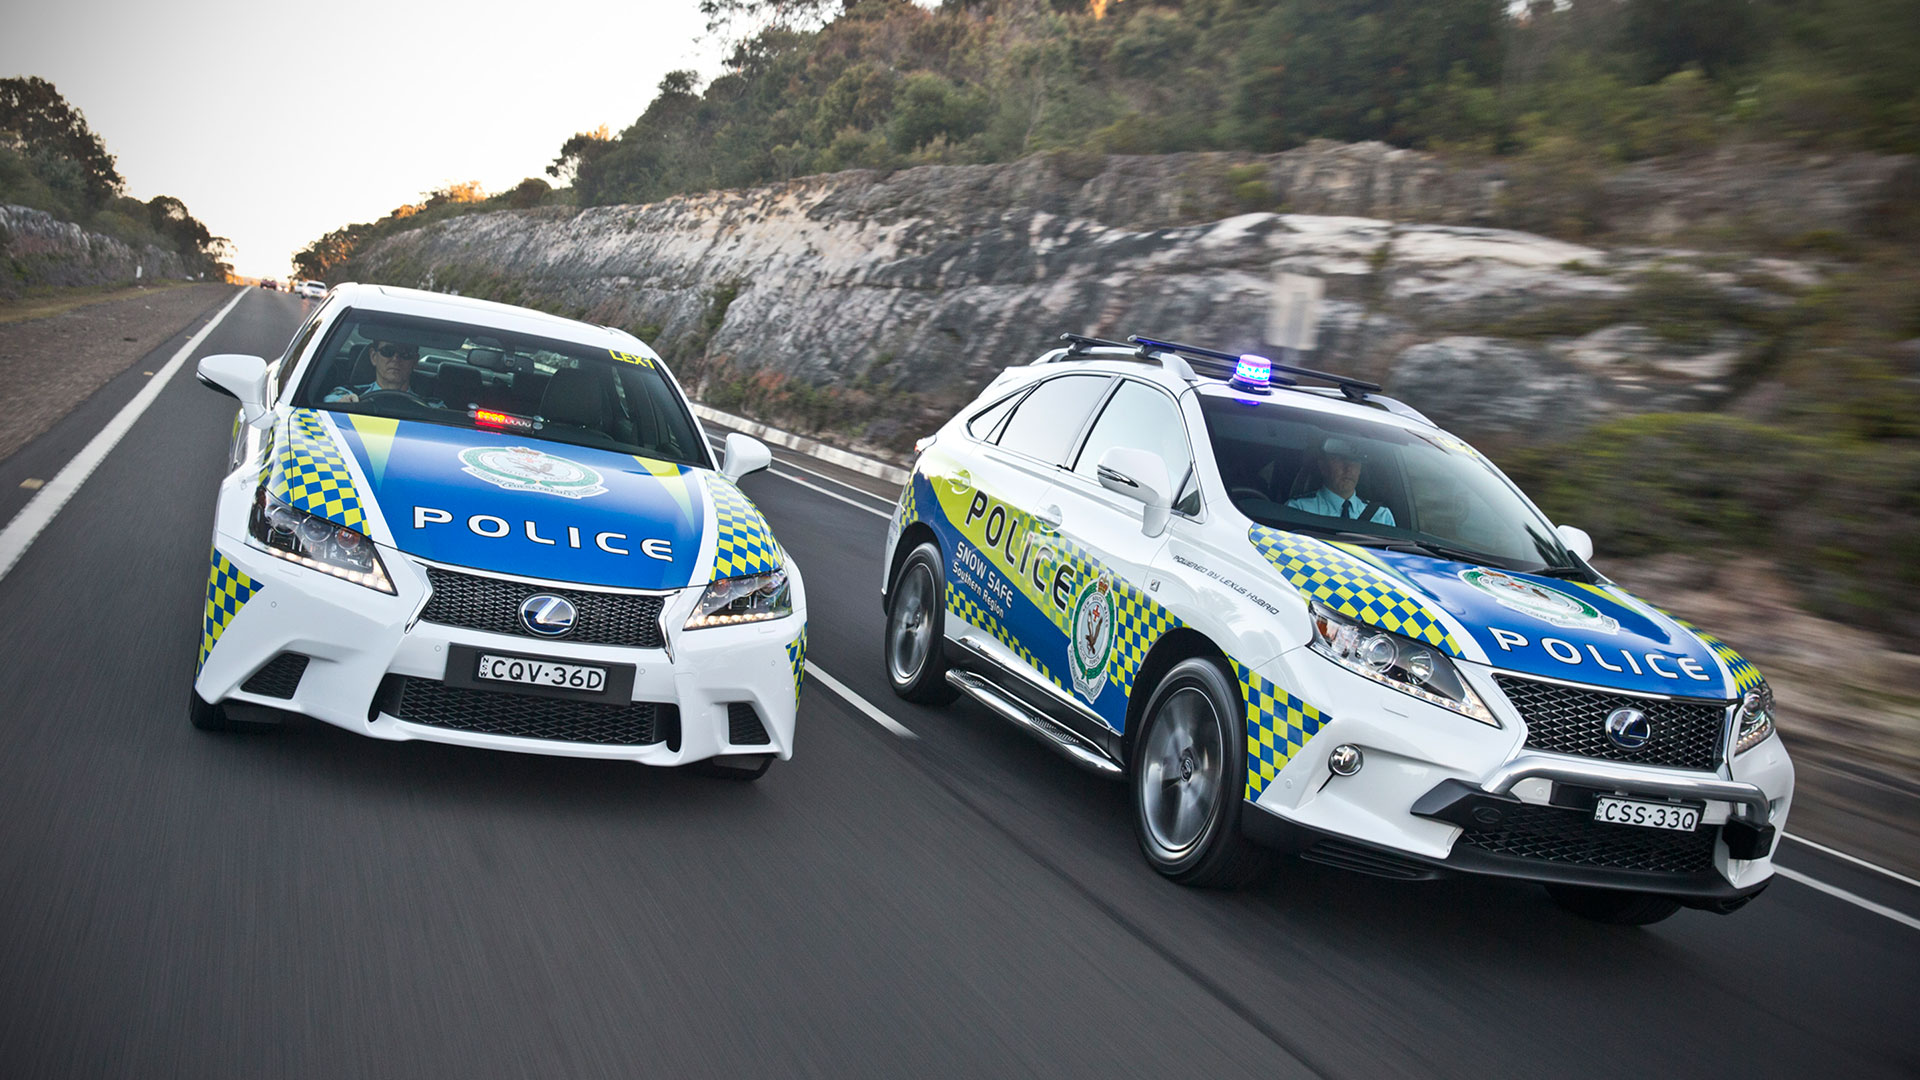 Lexus Hybrid Drive para policía hero asset